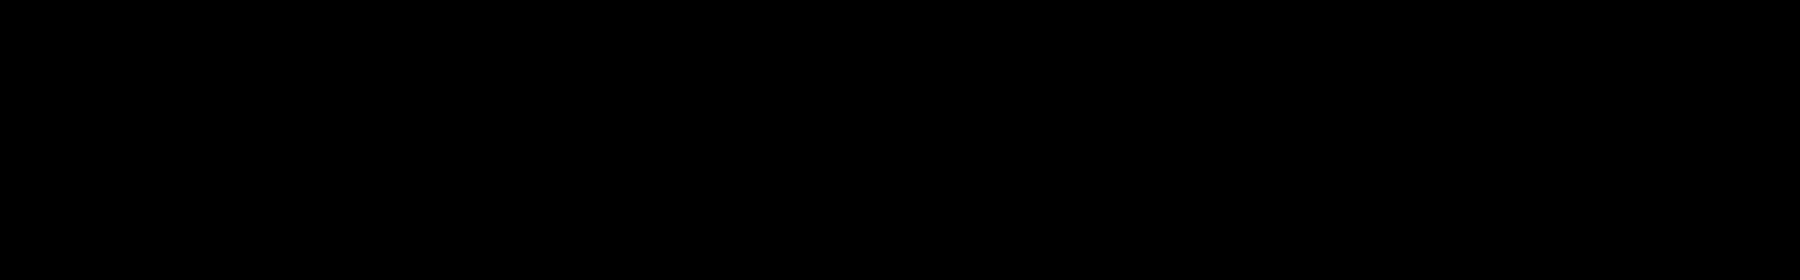 Matic audio waveform